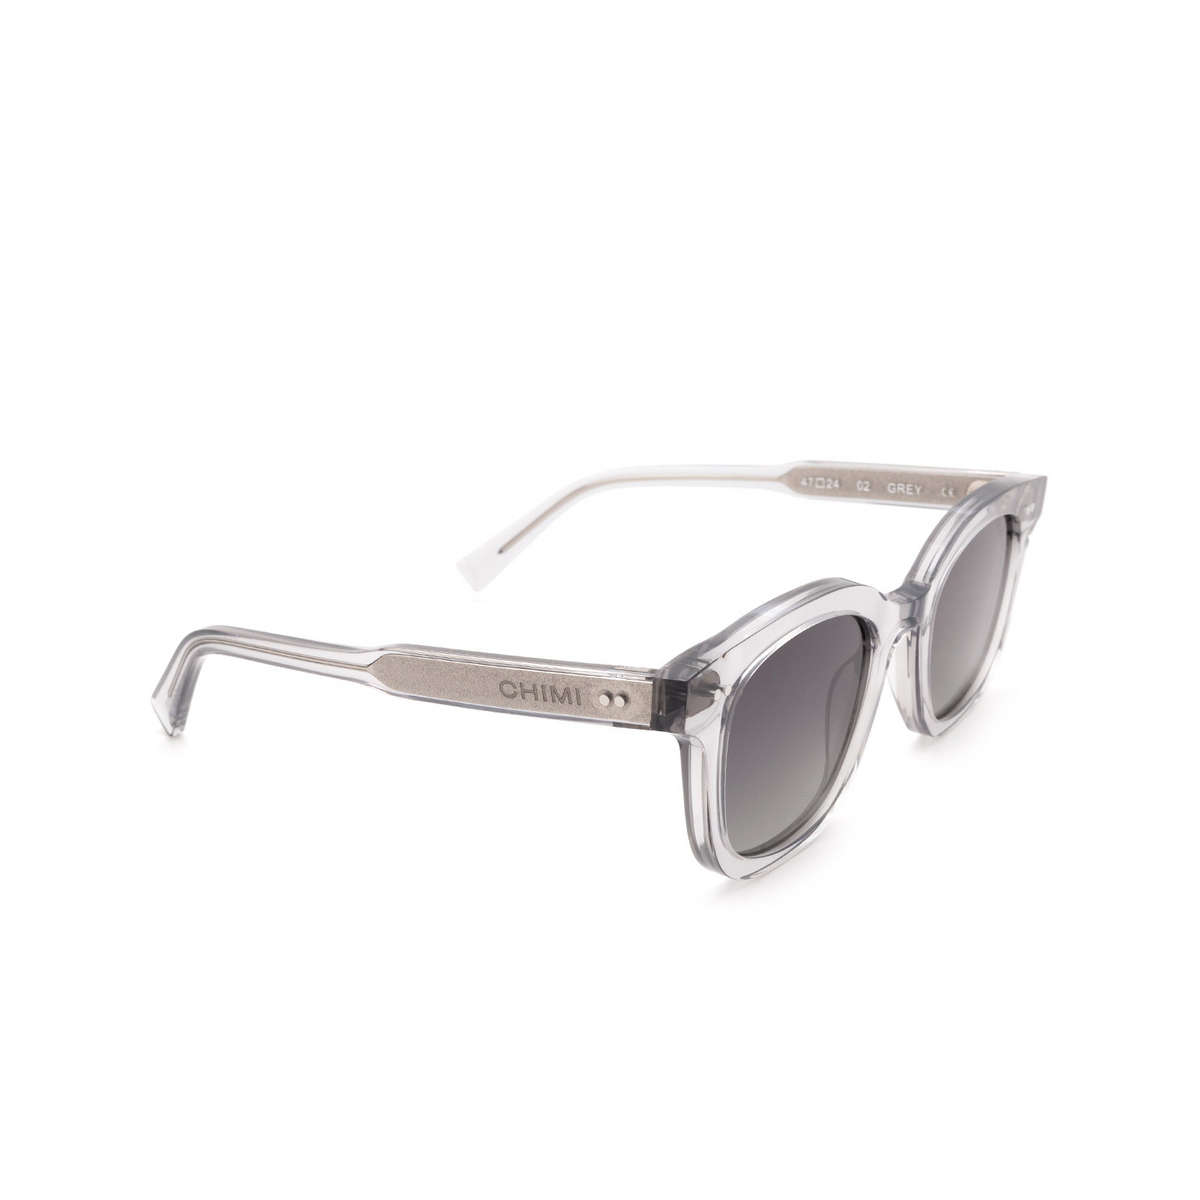 Chimi® Square Sunglasses: 02 color Grey - three-quarters view.